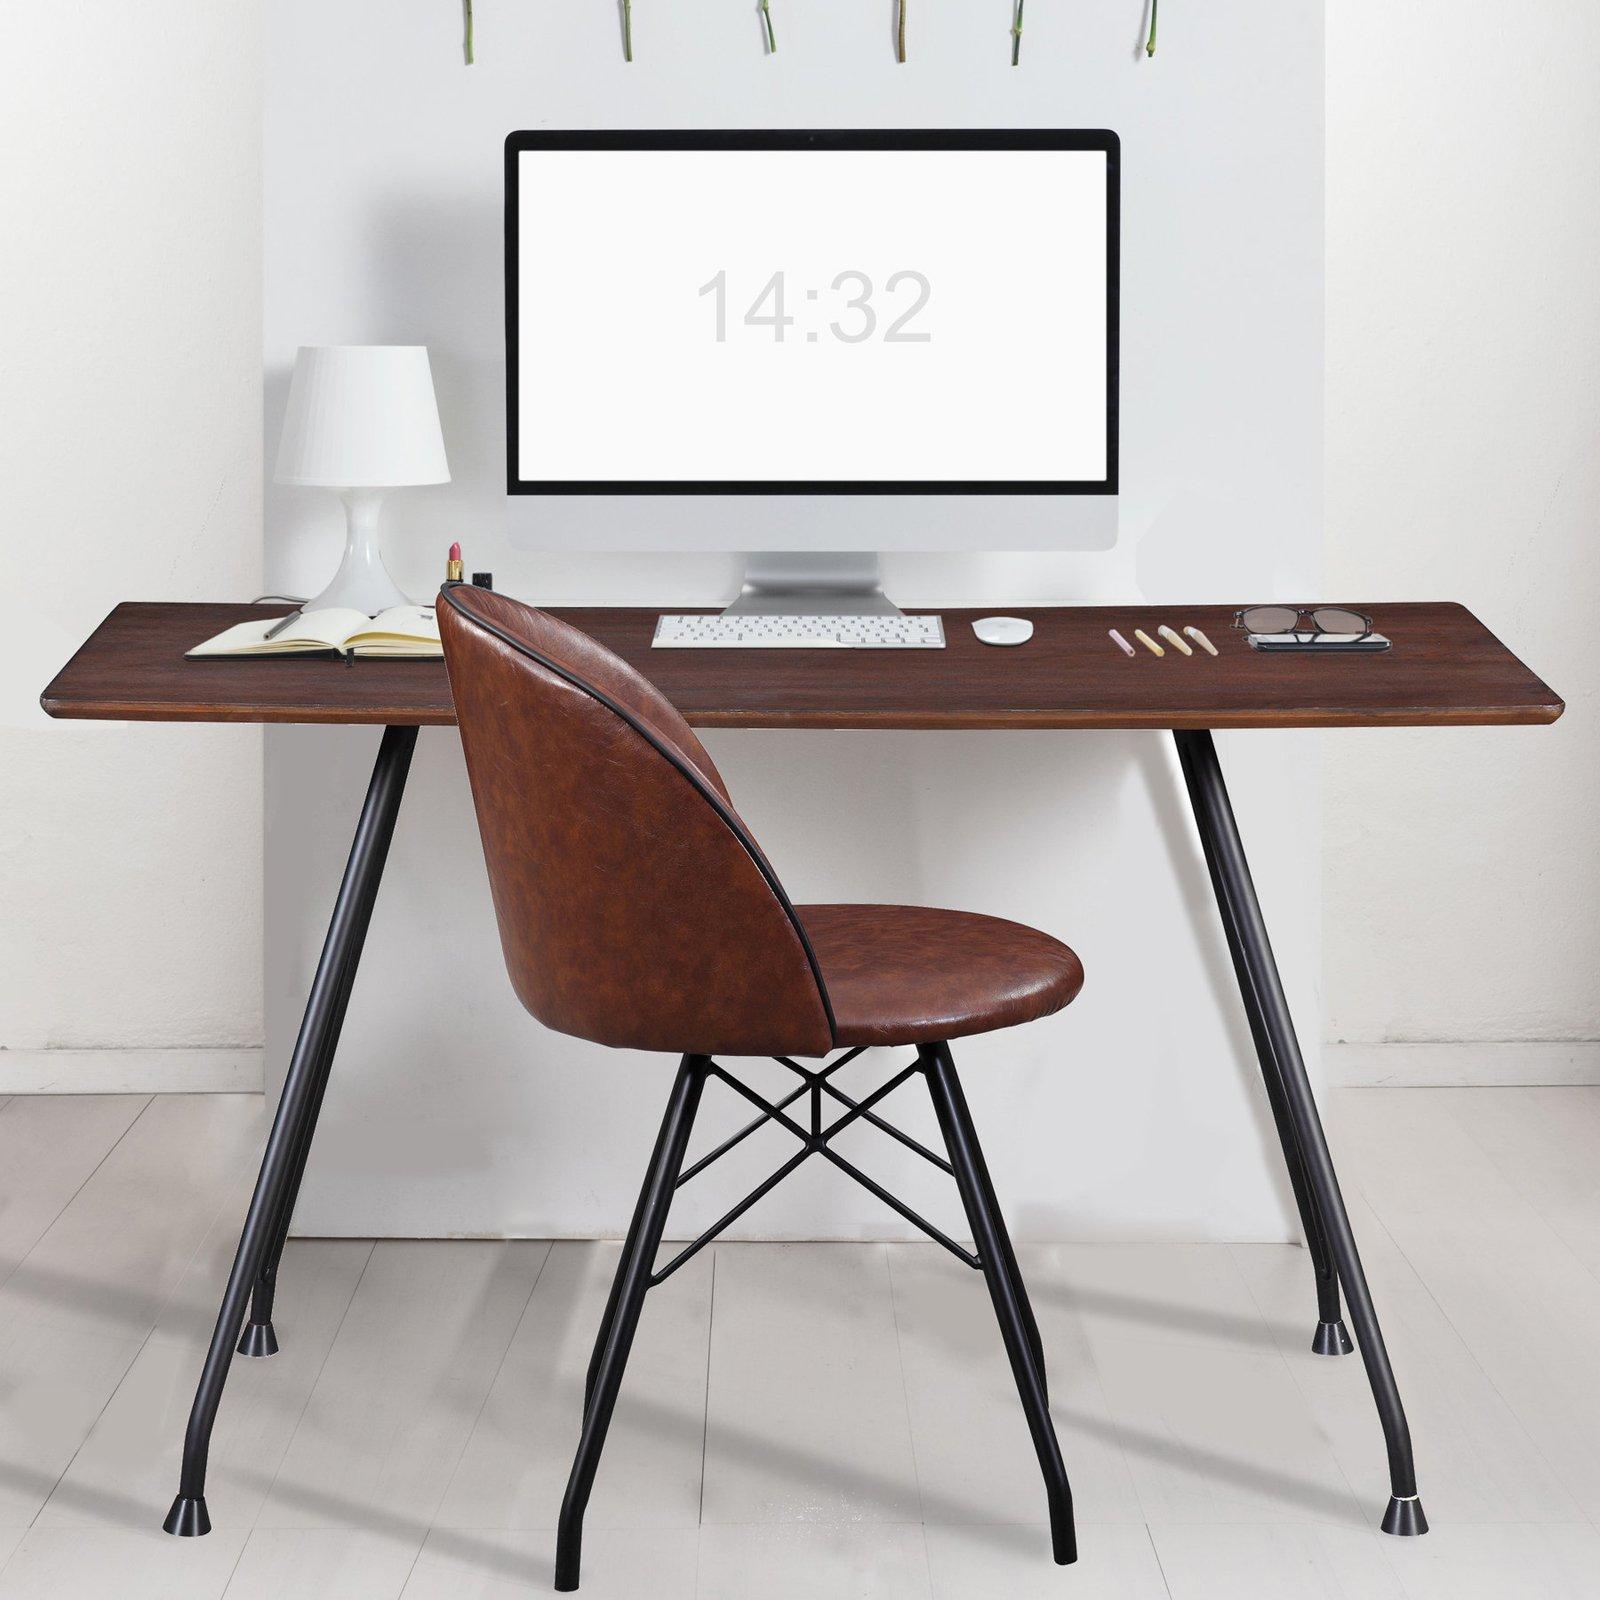 Dorian Table